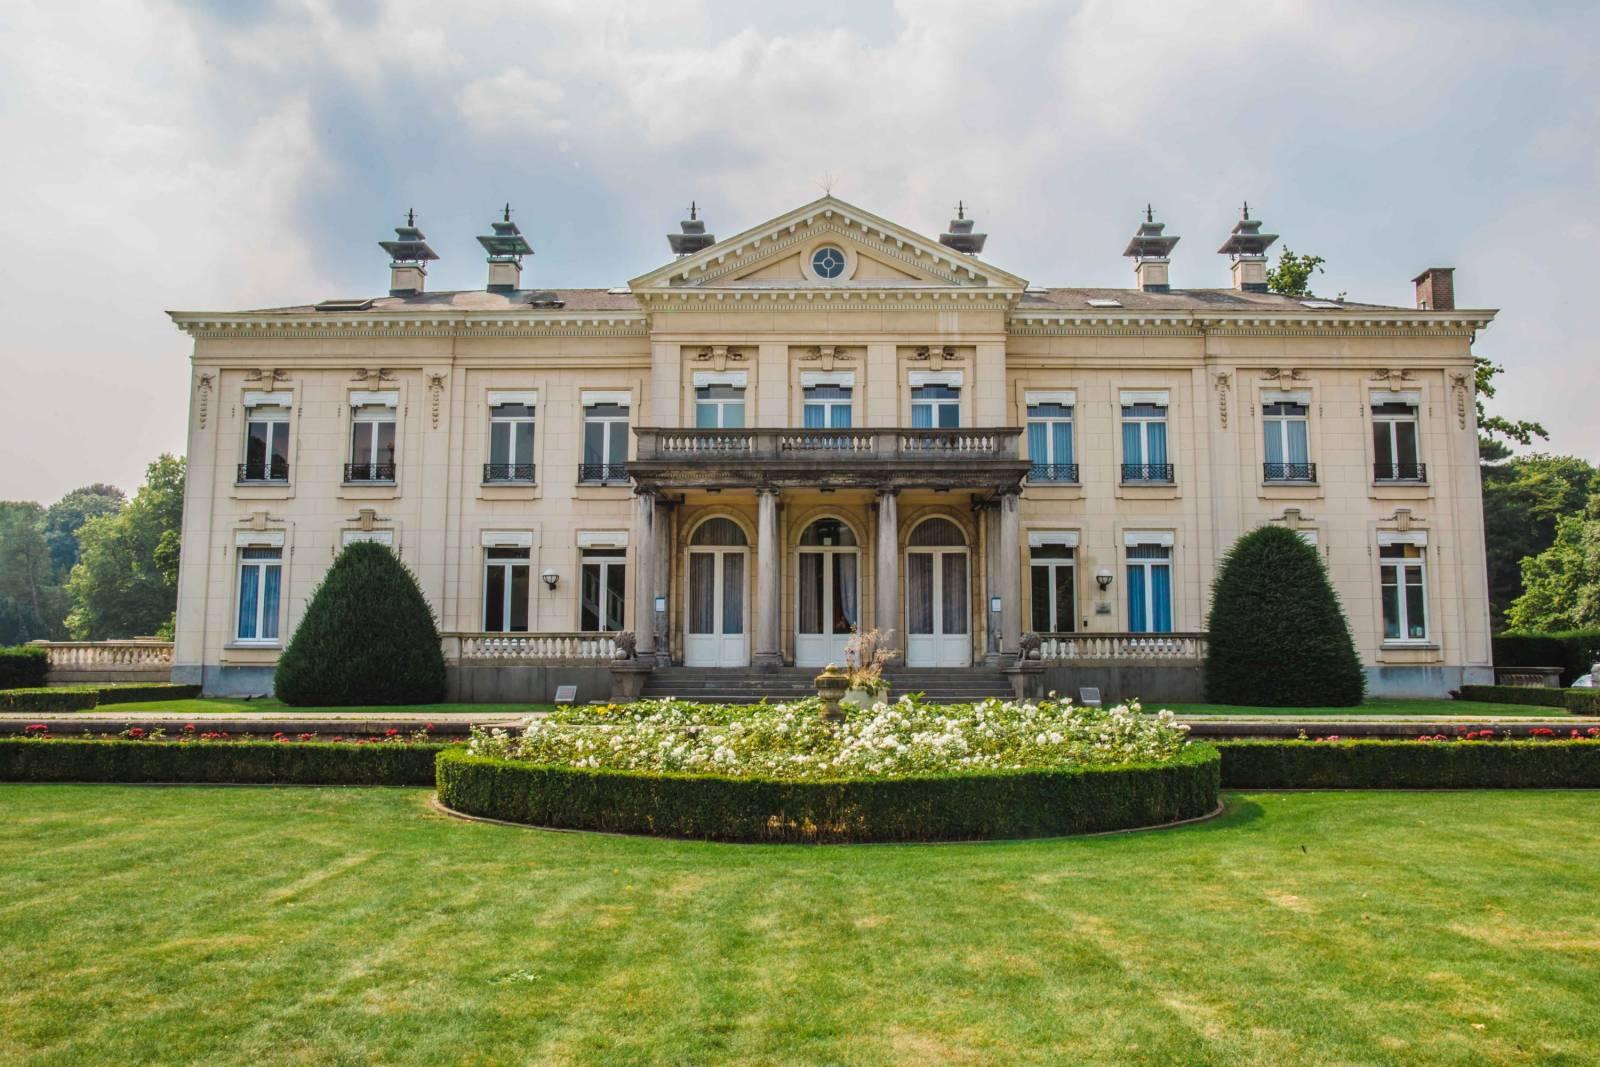 Kasteel Den Brandt - Feestzaal - Trouwzaal - Kasteel - House of Weddings - 21